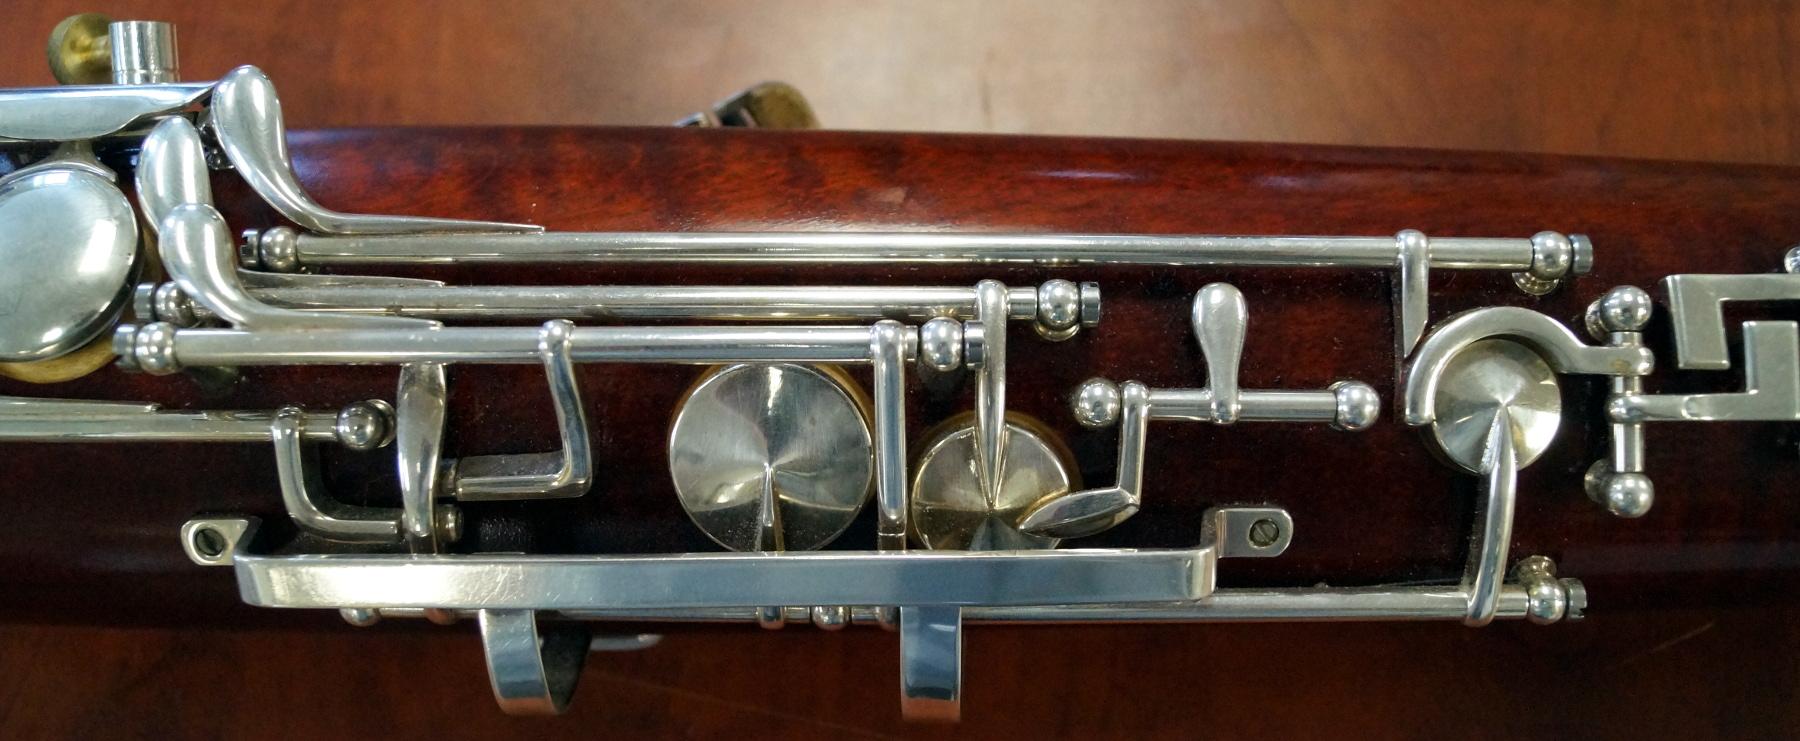 An automatic Ab/Bb trill mechanism retrofit | Trent Jacobs